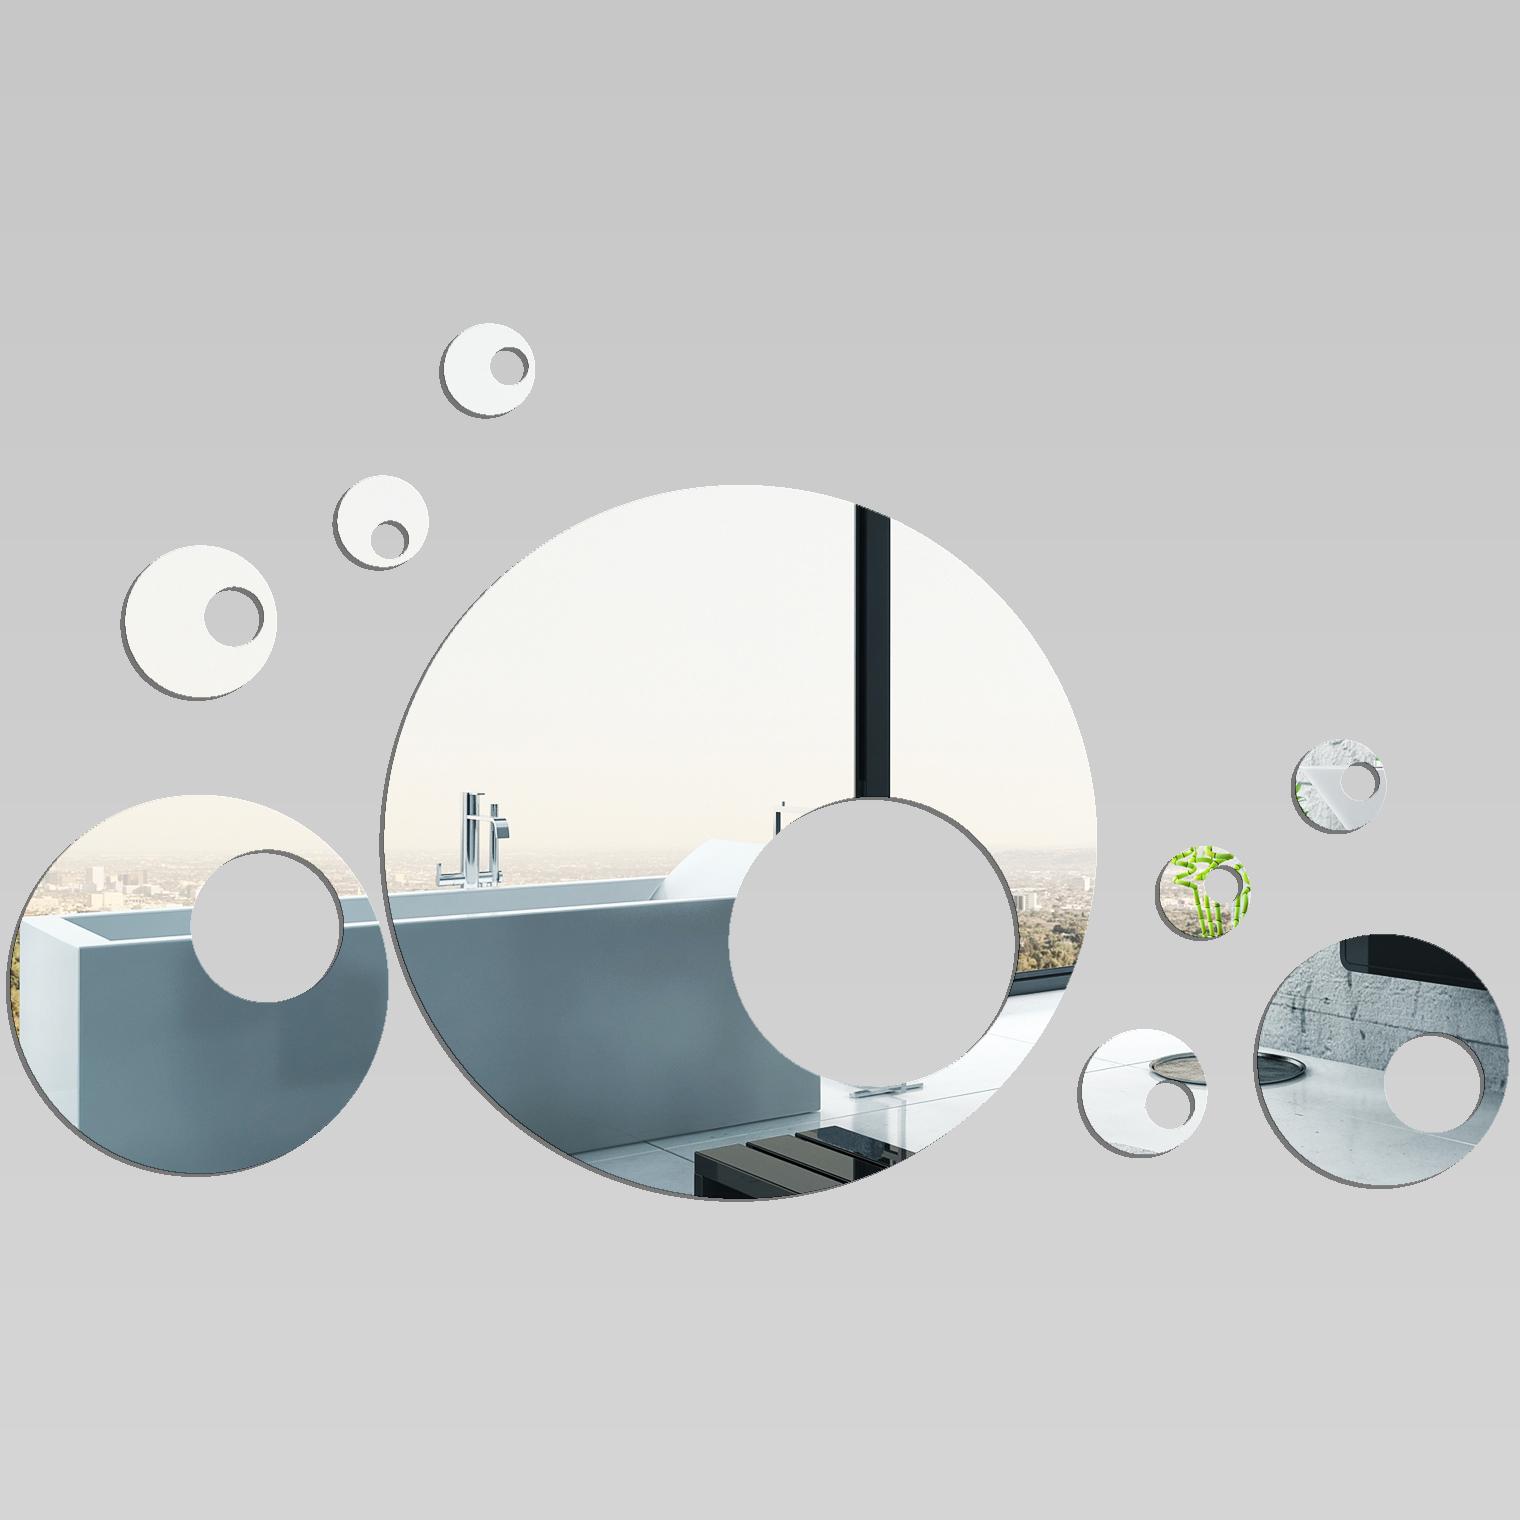 Miroir plexiglass acrylique design 9 pas cher - Wandspiegel design ...